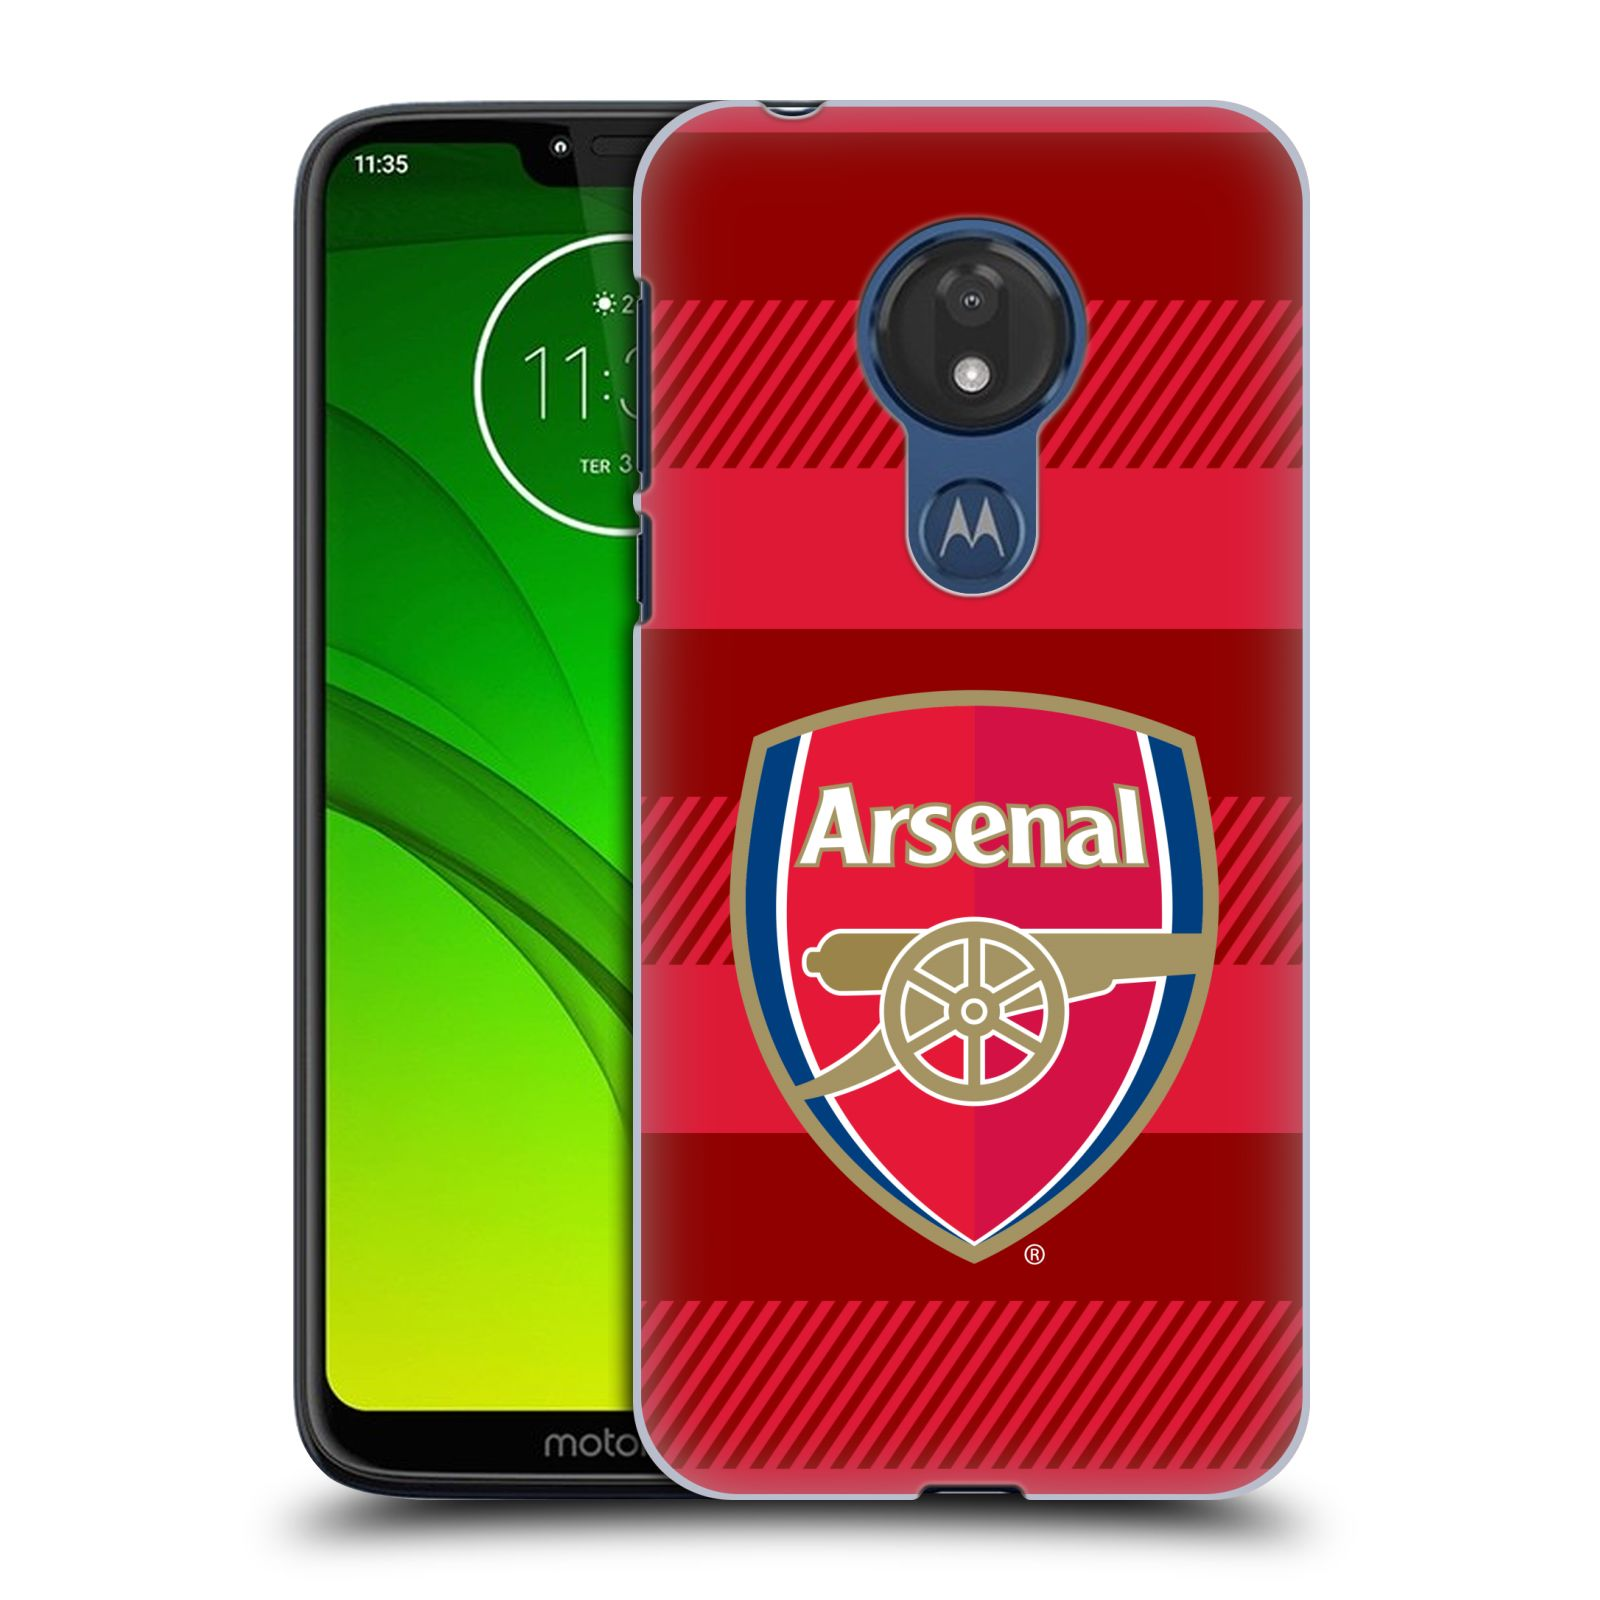 Plastové pouzdro na mobil Motorola Moto G7 Power - Head Case - Arsenal FC - Logo s pruhy